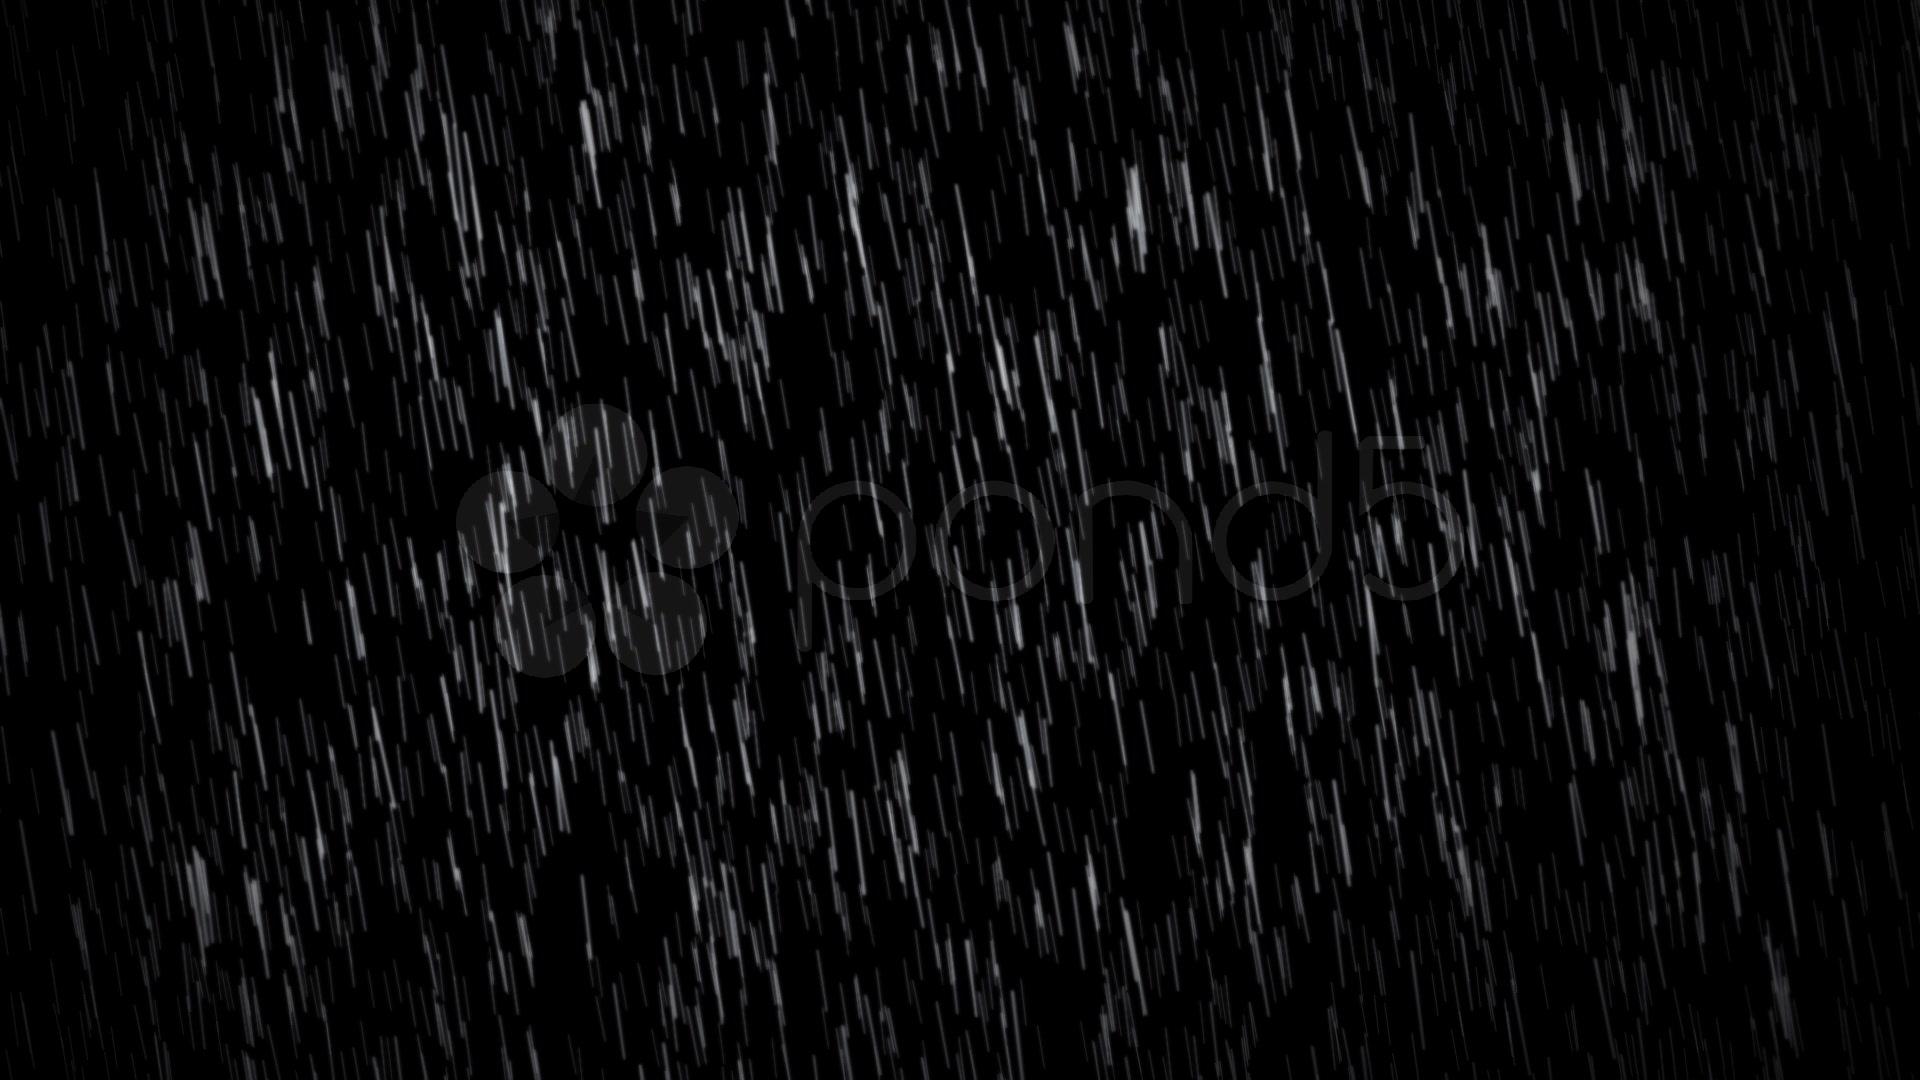 Snow Falling Video Wallpaper Rain Overlay Stock Video 740933 Hd Stock Footage